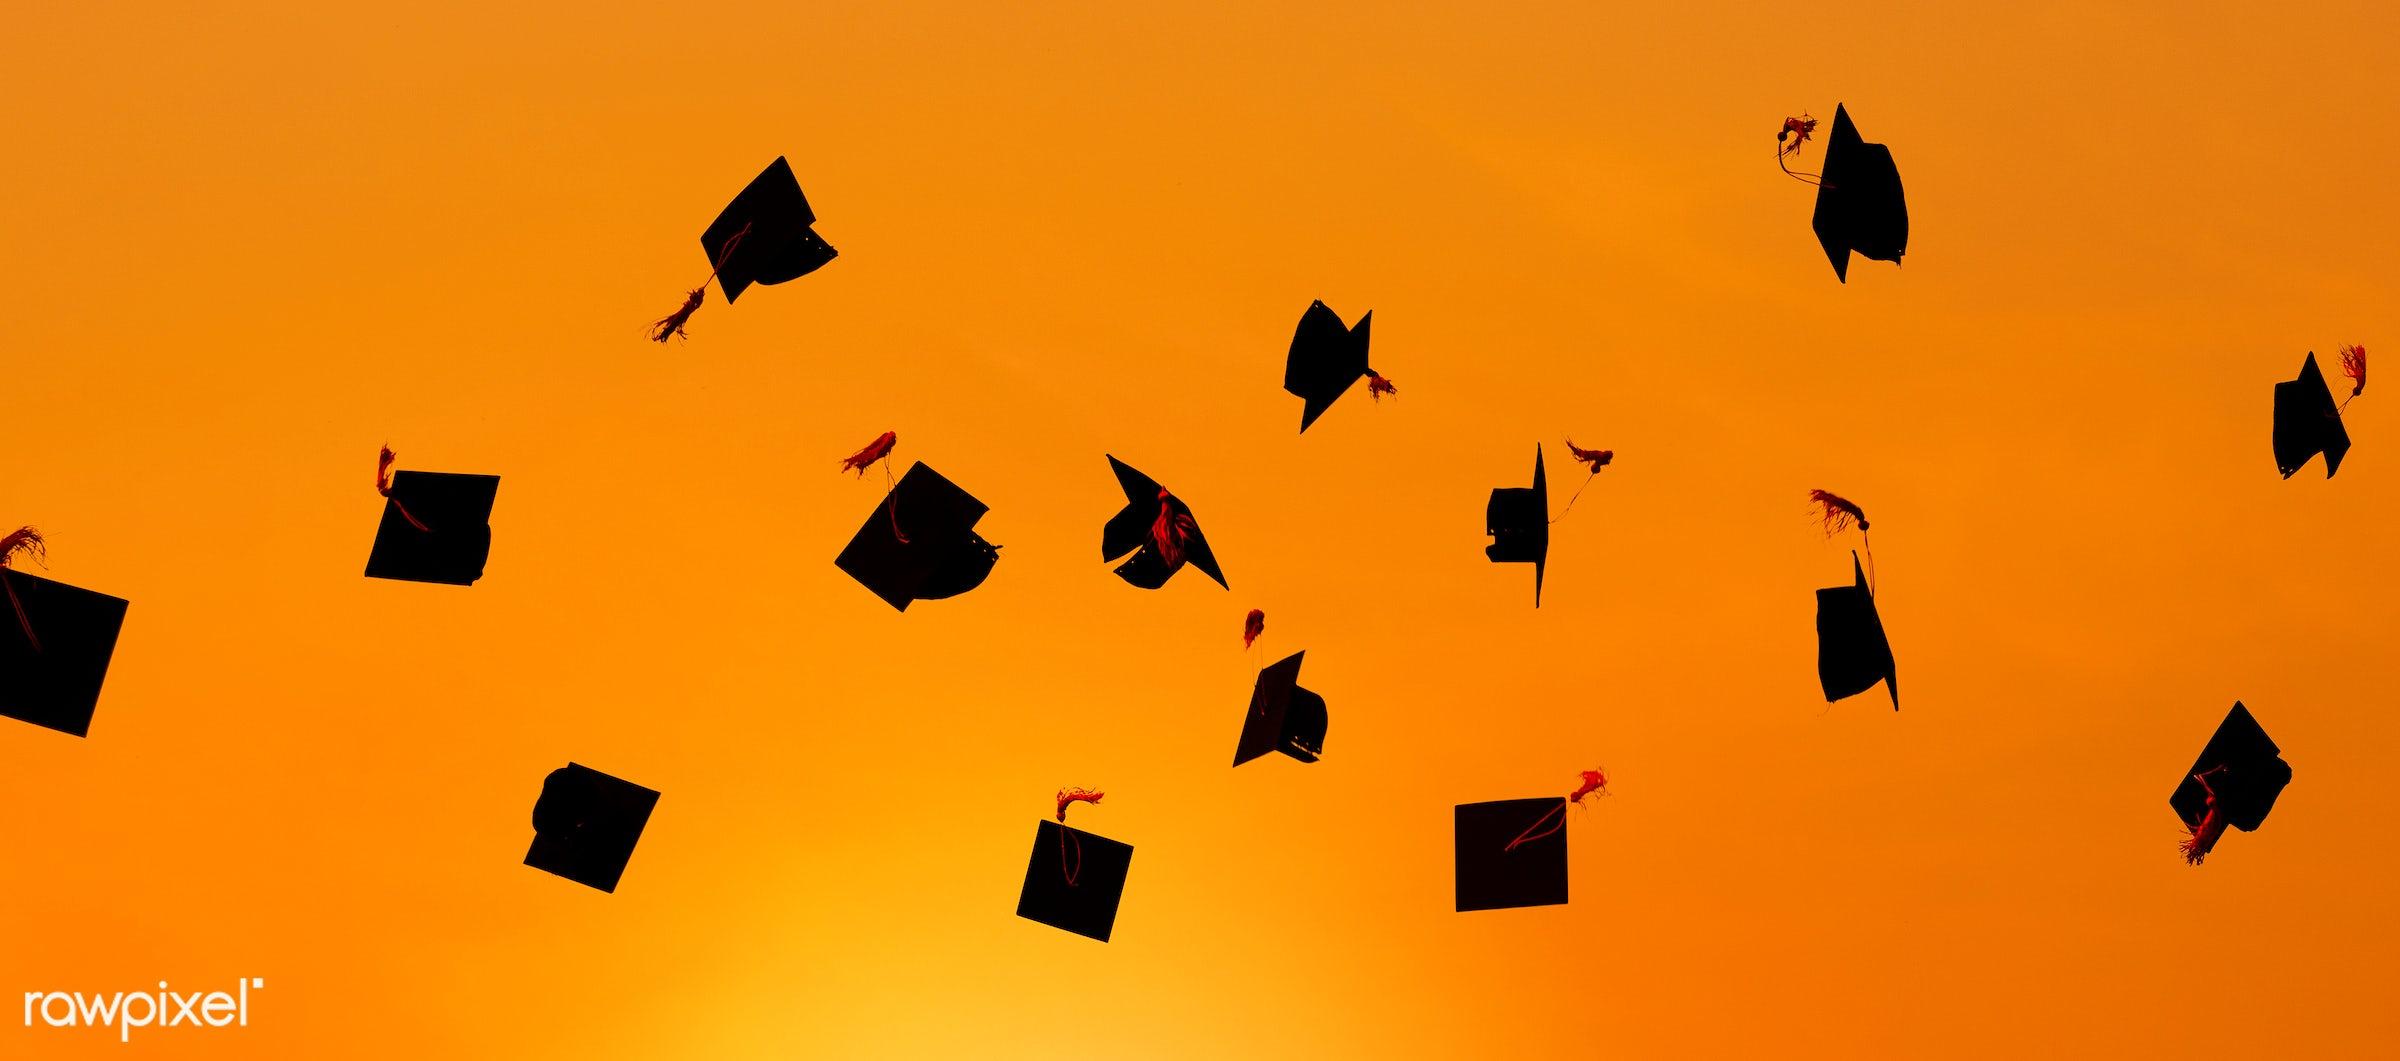 hat, academic, achievement, campus, cap, celebration, ceremony, certificate, cheerful, college, college student,...